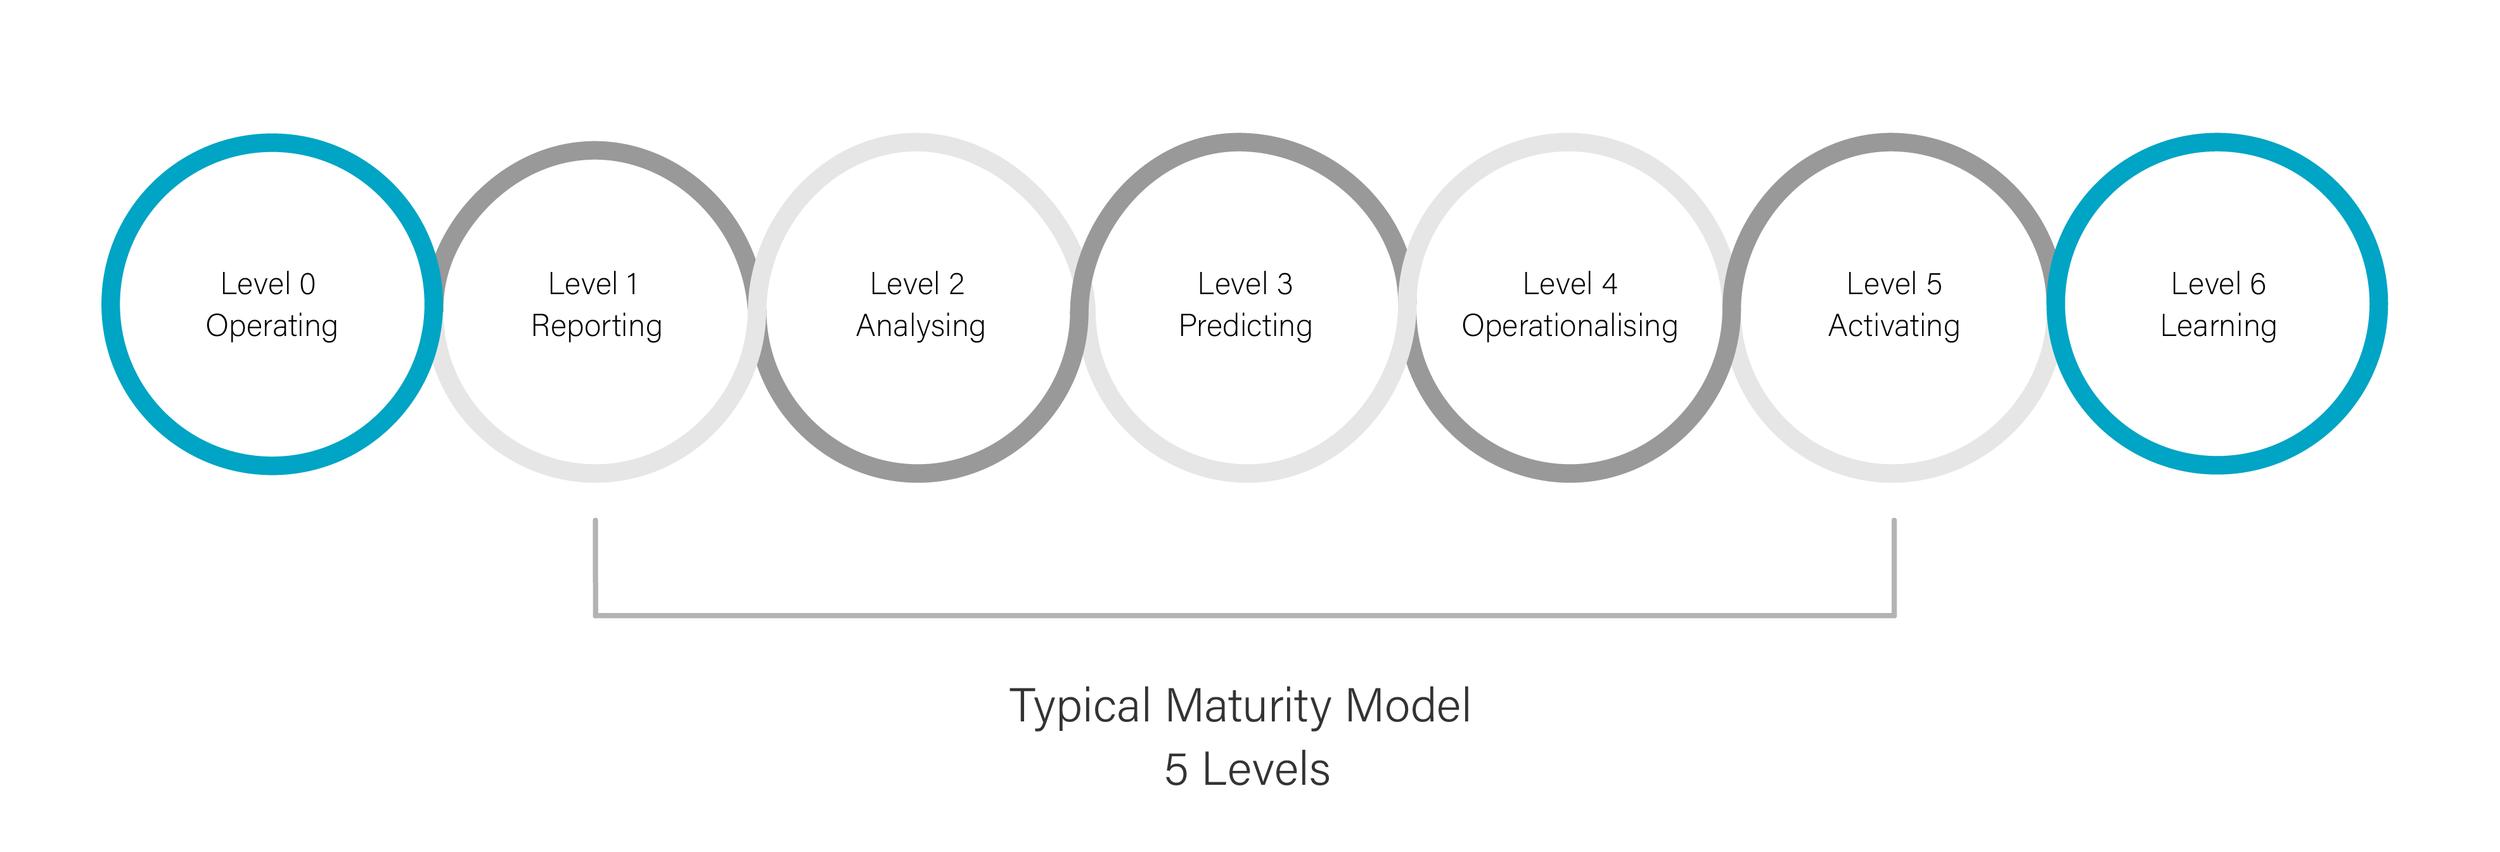 Maturity level chart